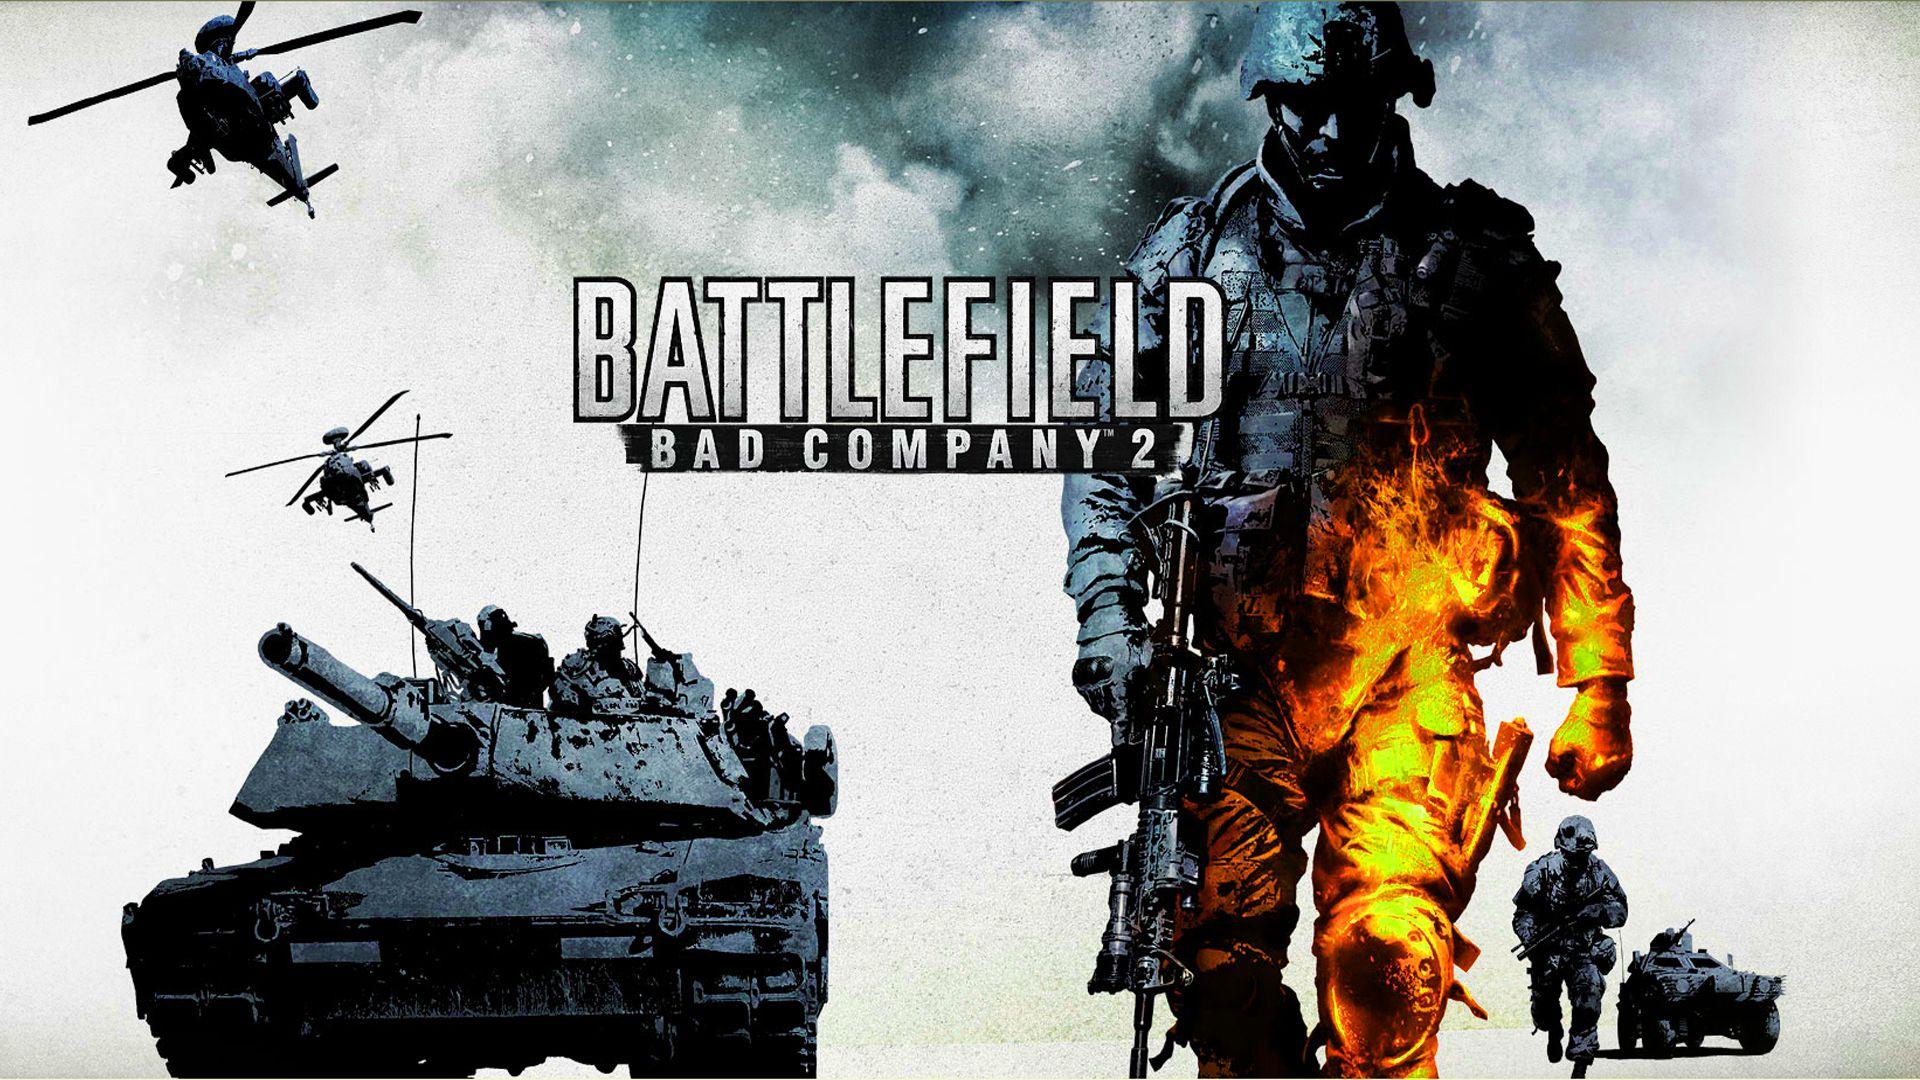 Battlefield 2 Bad Company Wallpaper 1920x1080